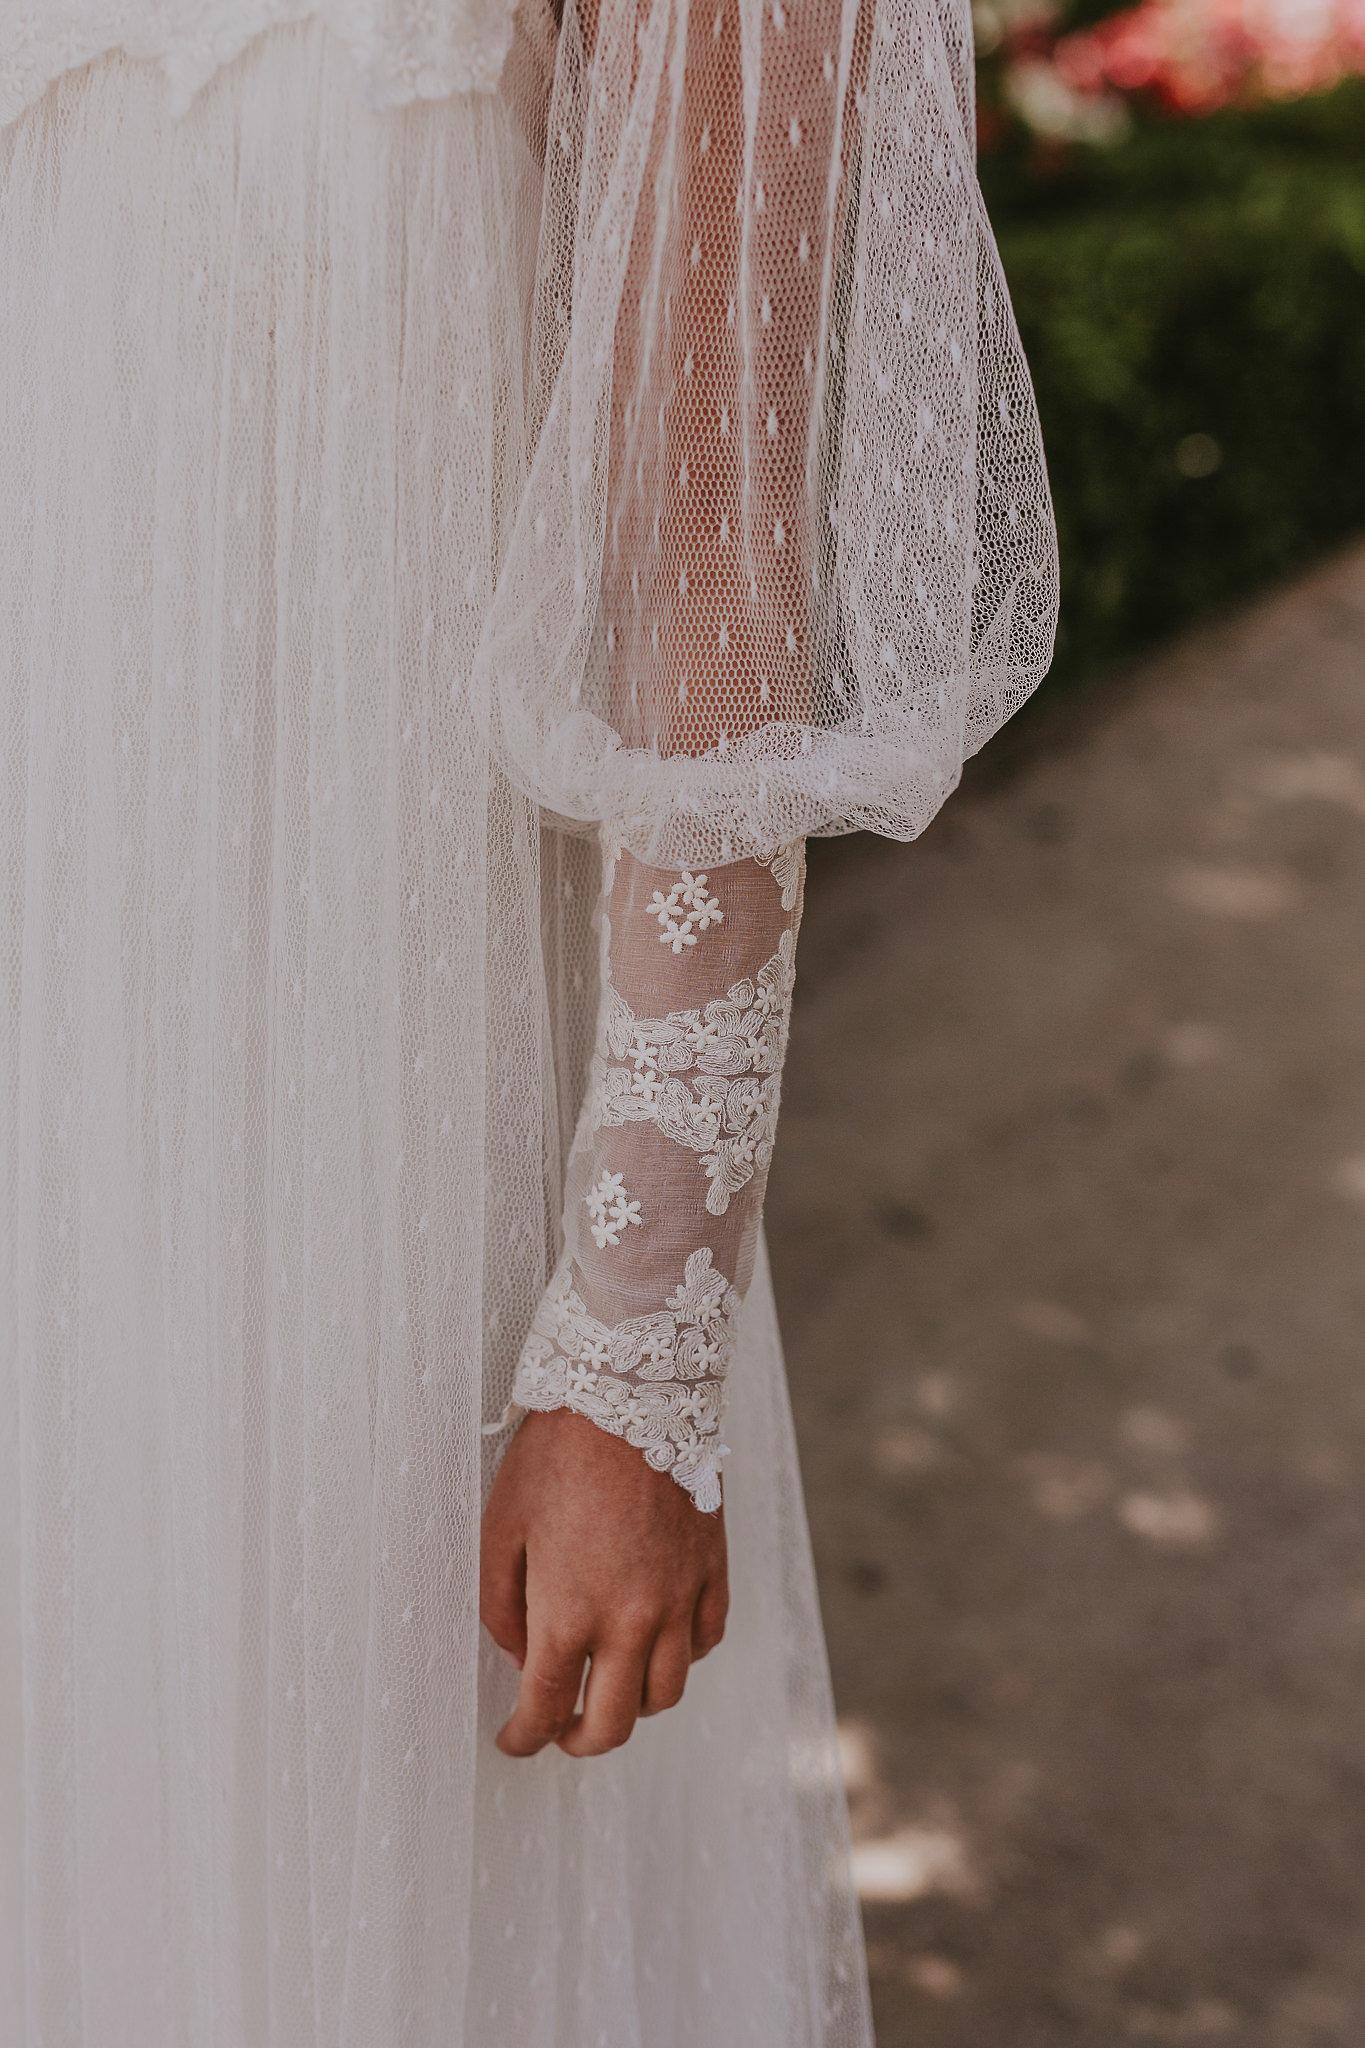 Oriental Flower - Lorena Merino